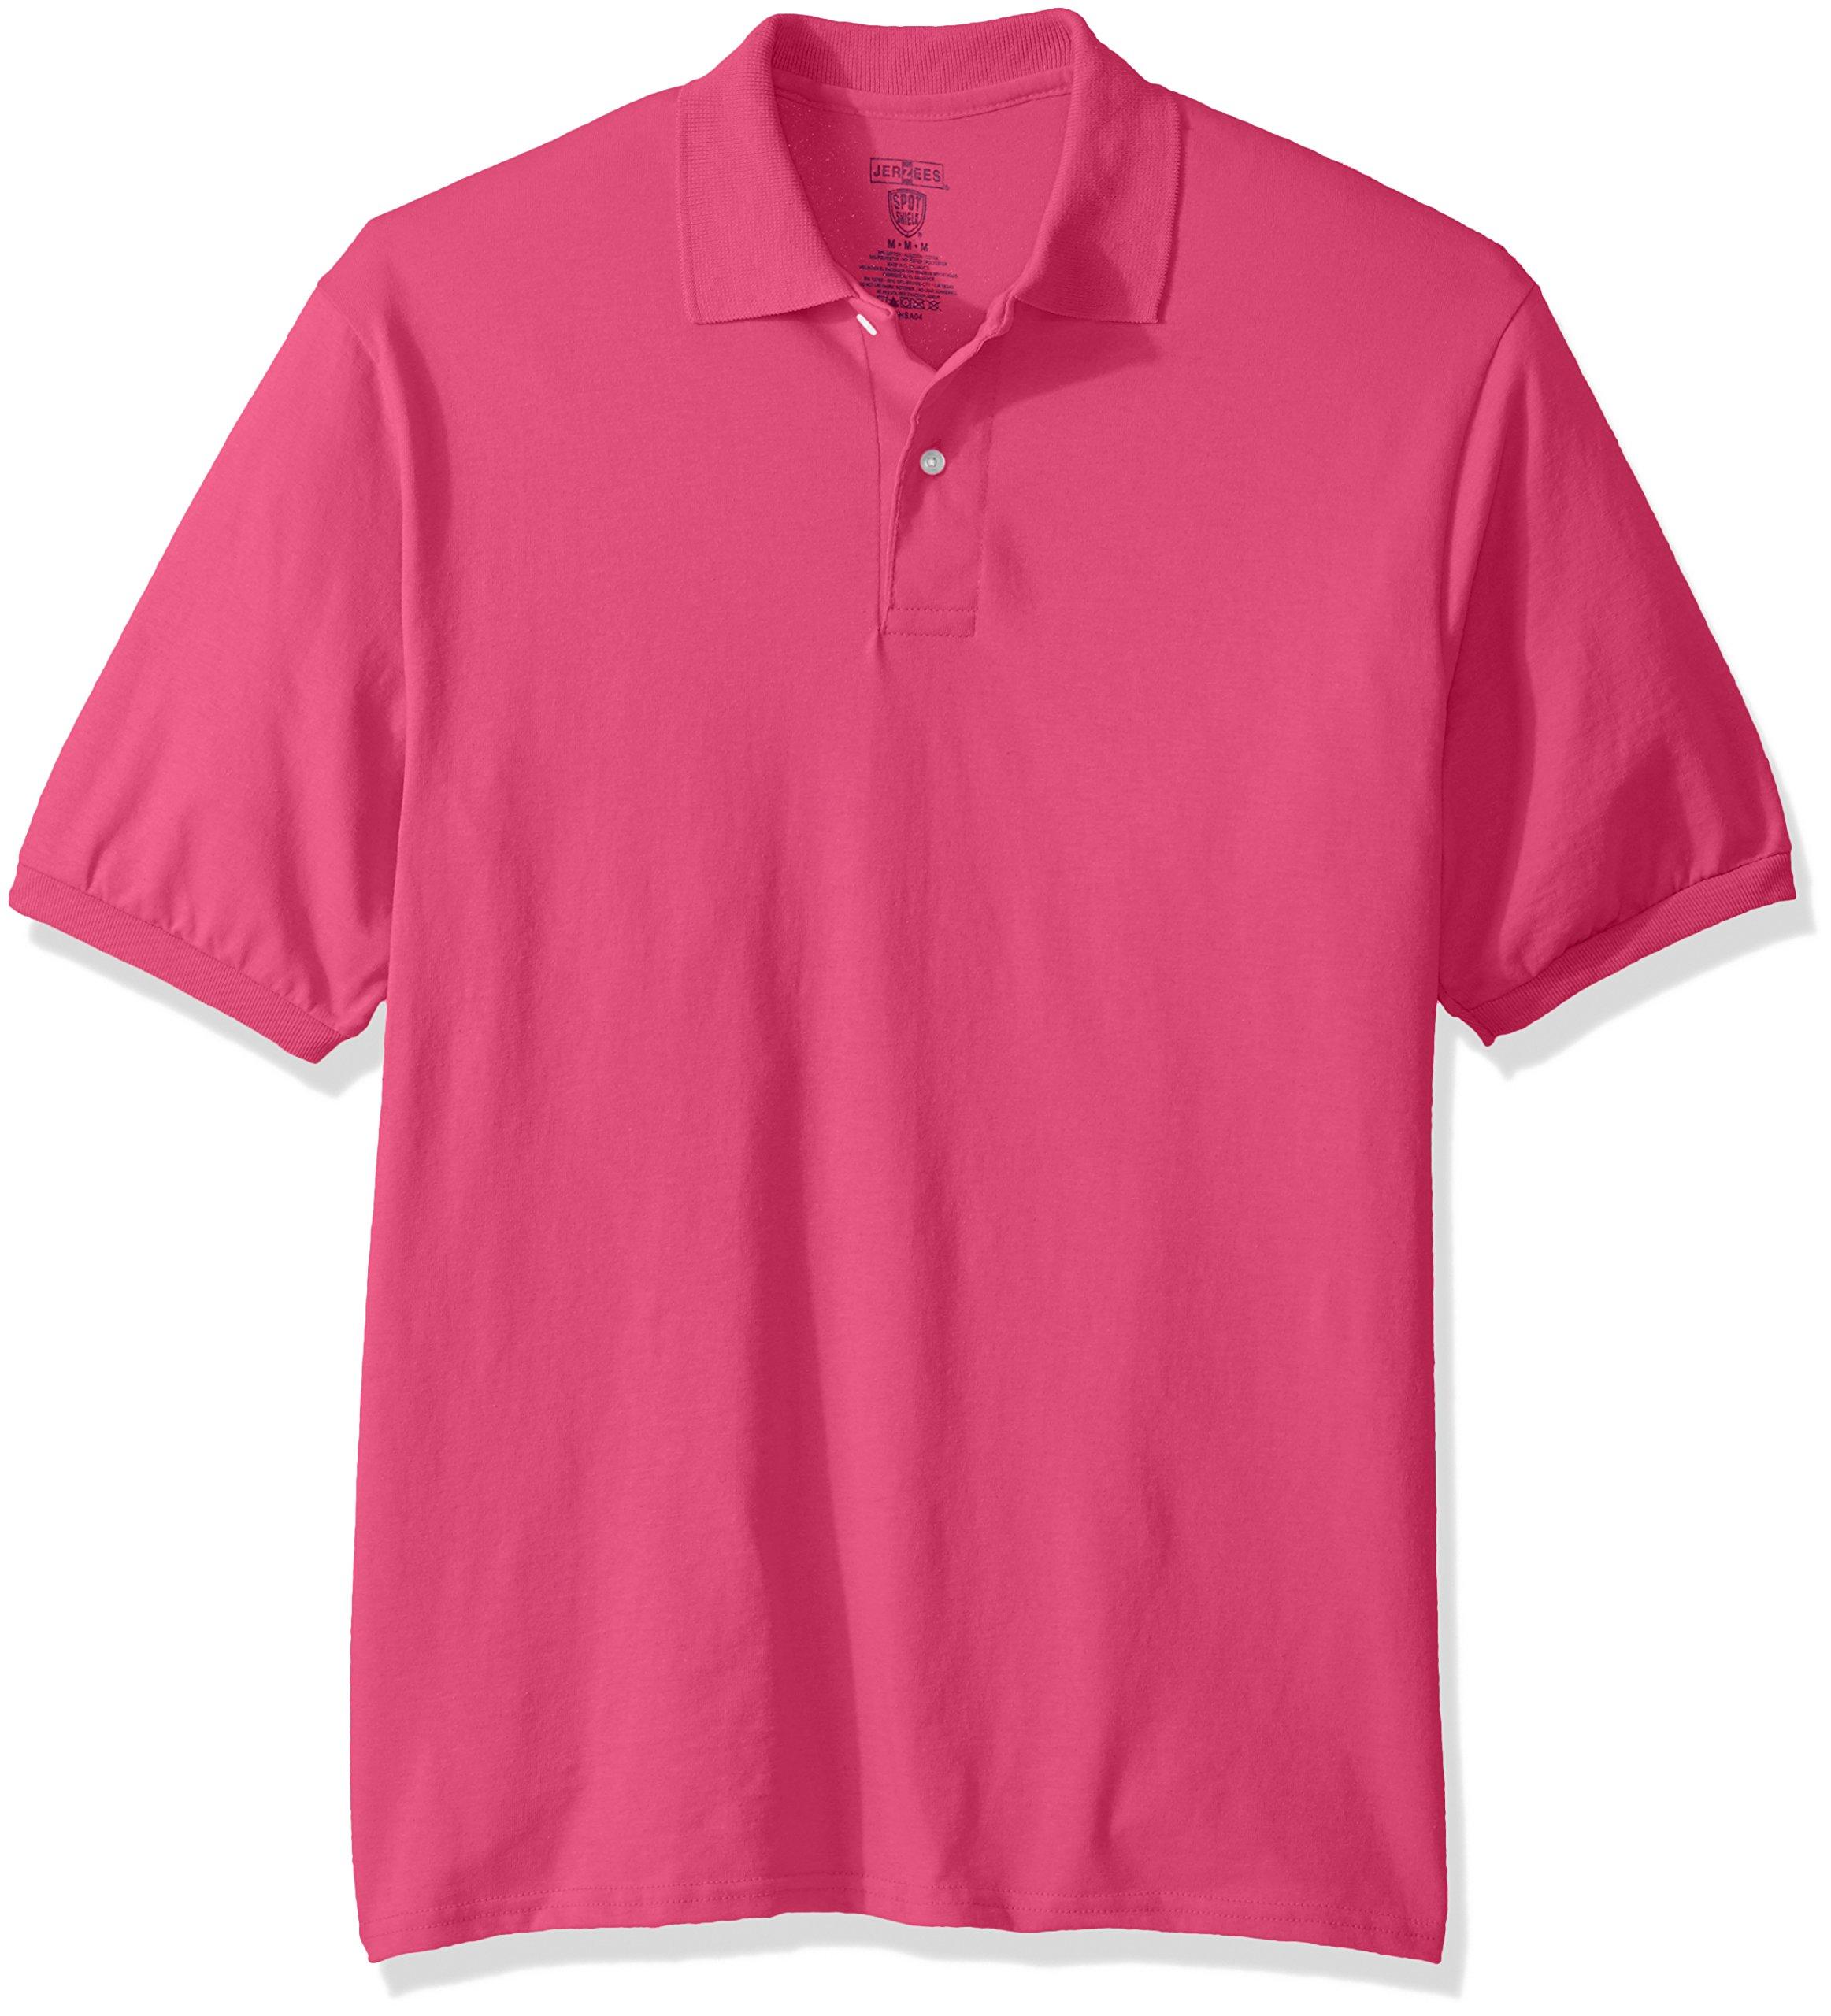 Jerzees Men's Spot Shield Short Sleeve Polo Sport Shirt, Cyber Pink, 2X-Large